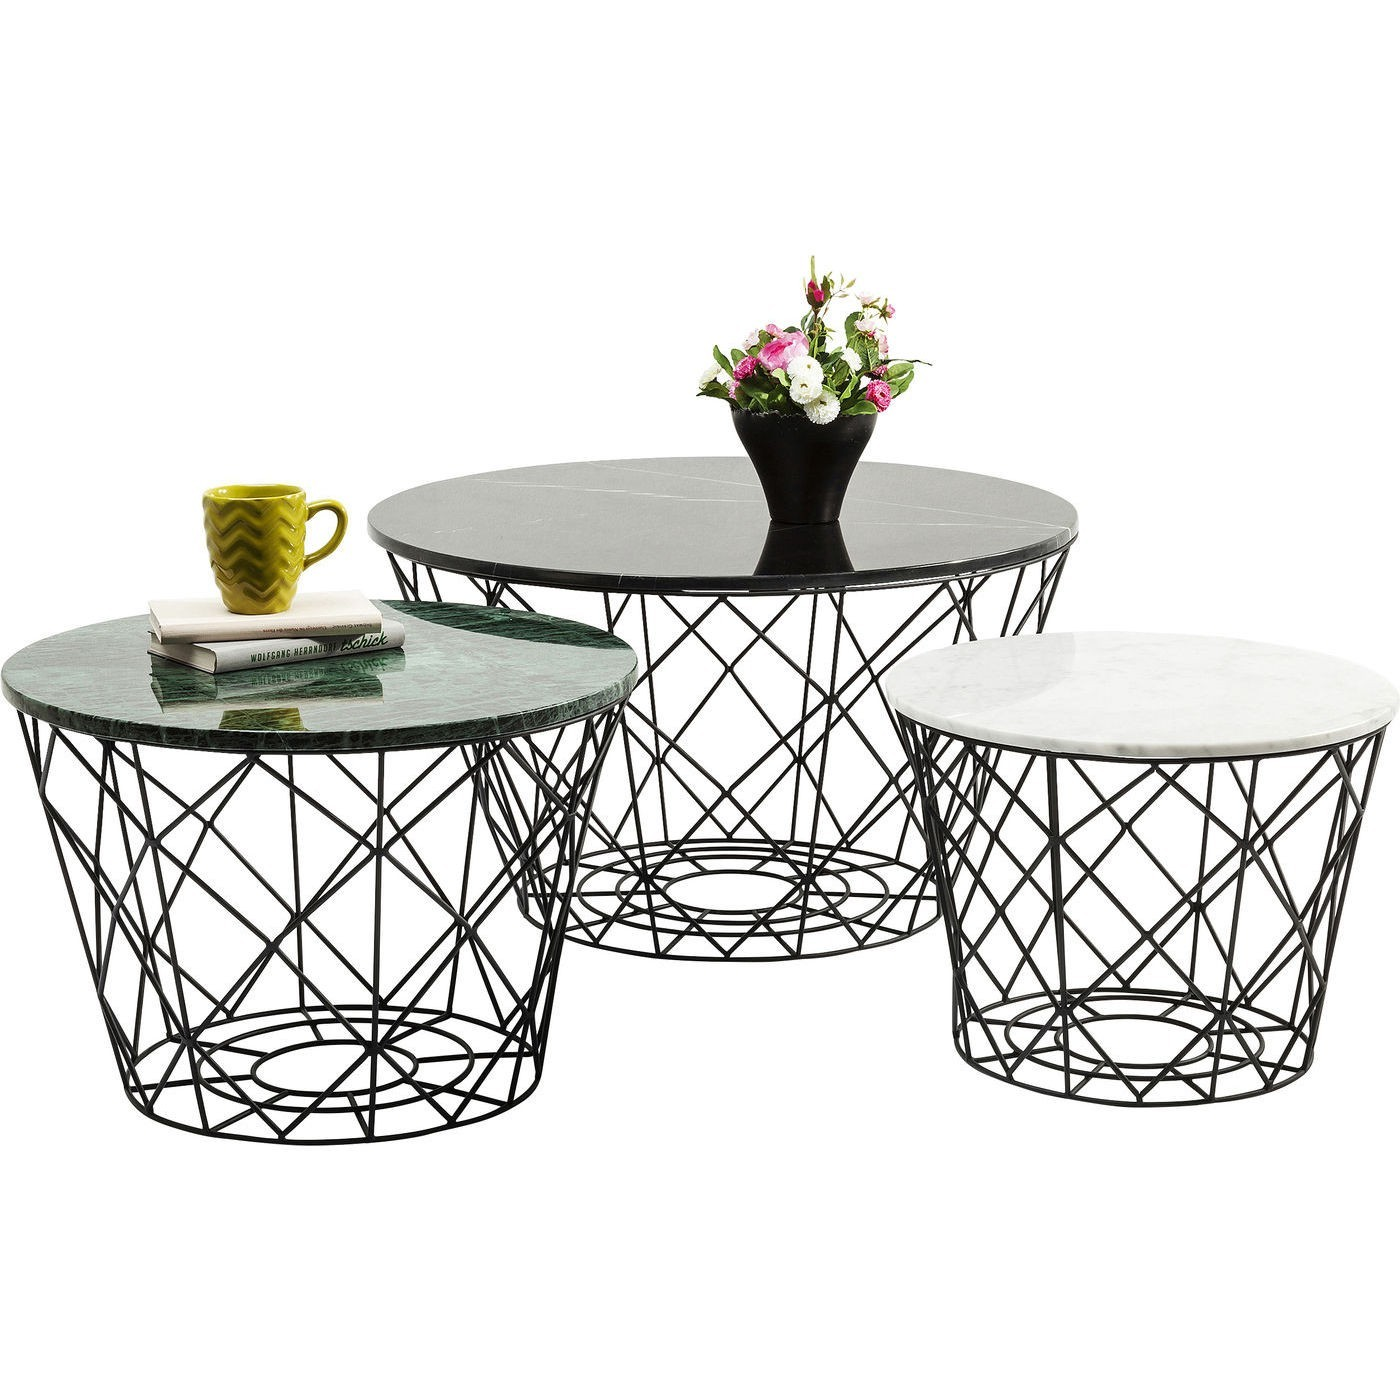 Tables basses East rond set de 3 Kare Design